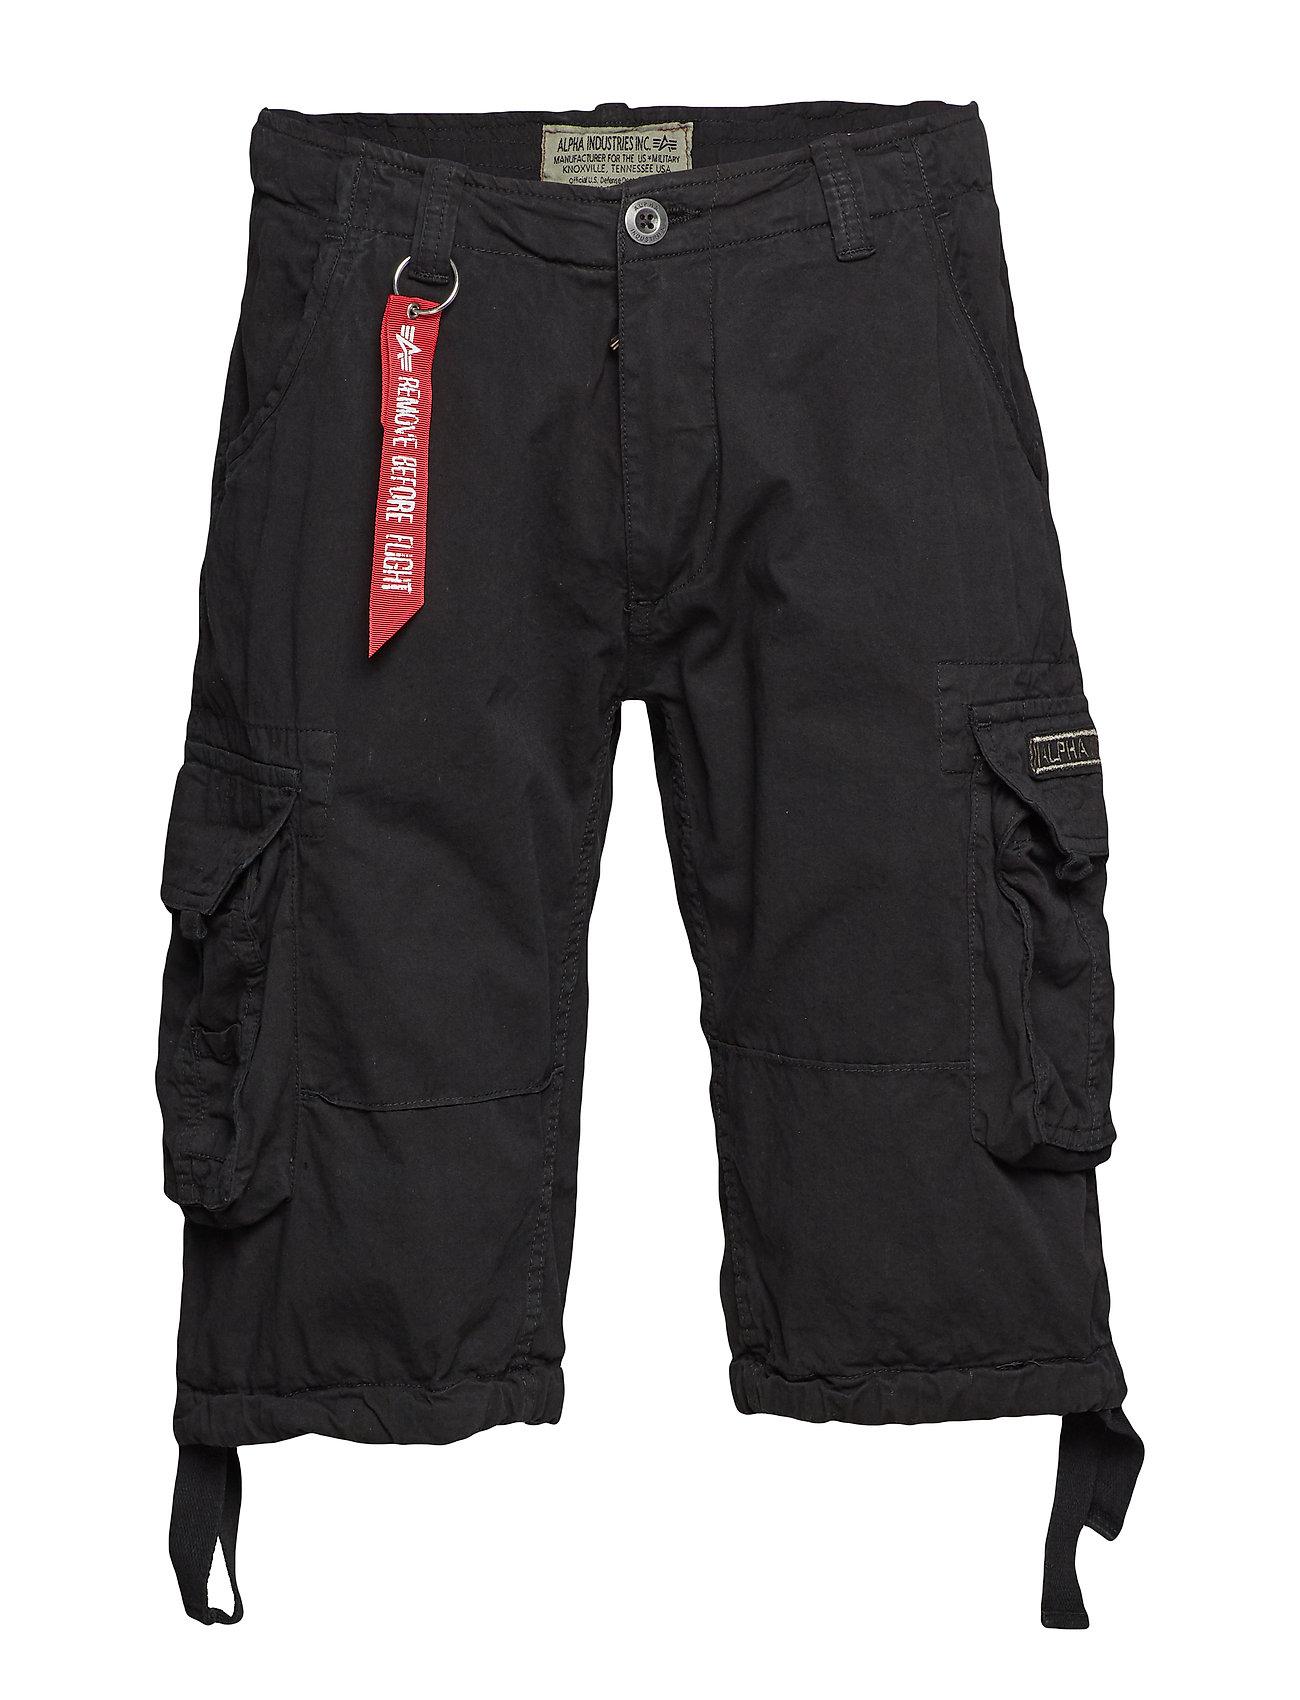 Alpha Industries Jet Short Shorts